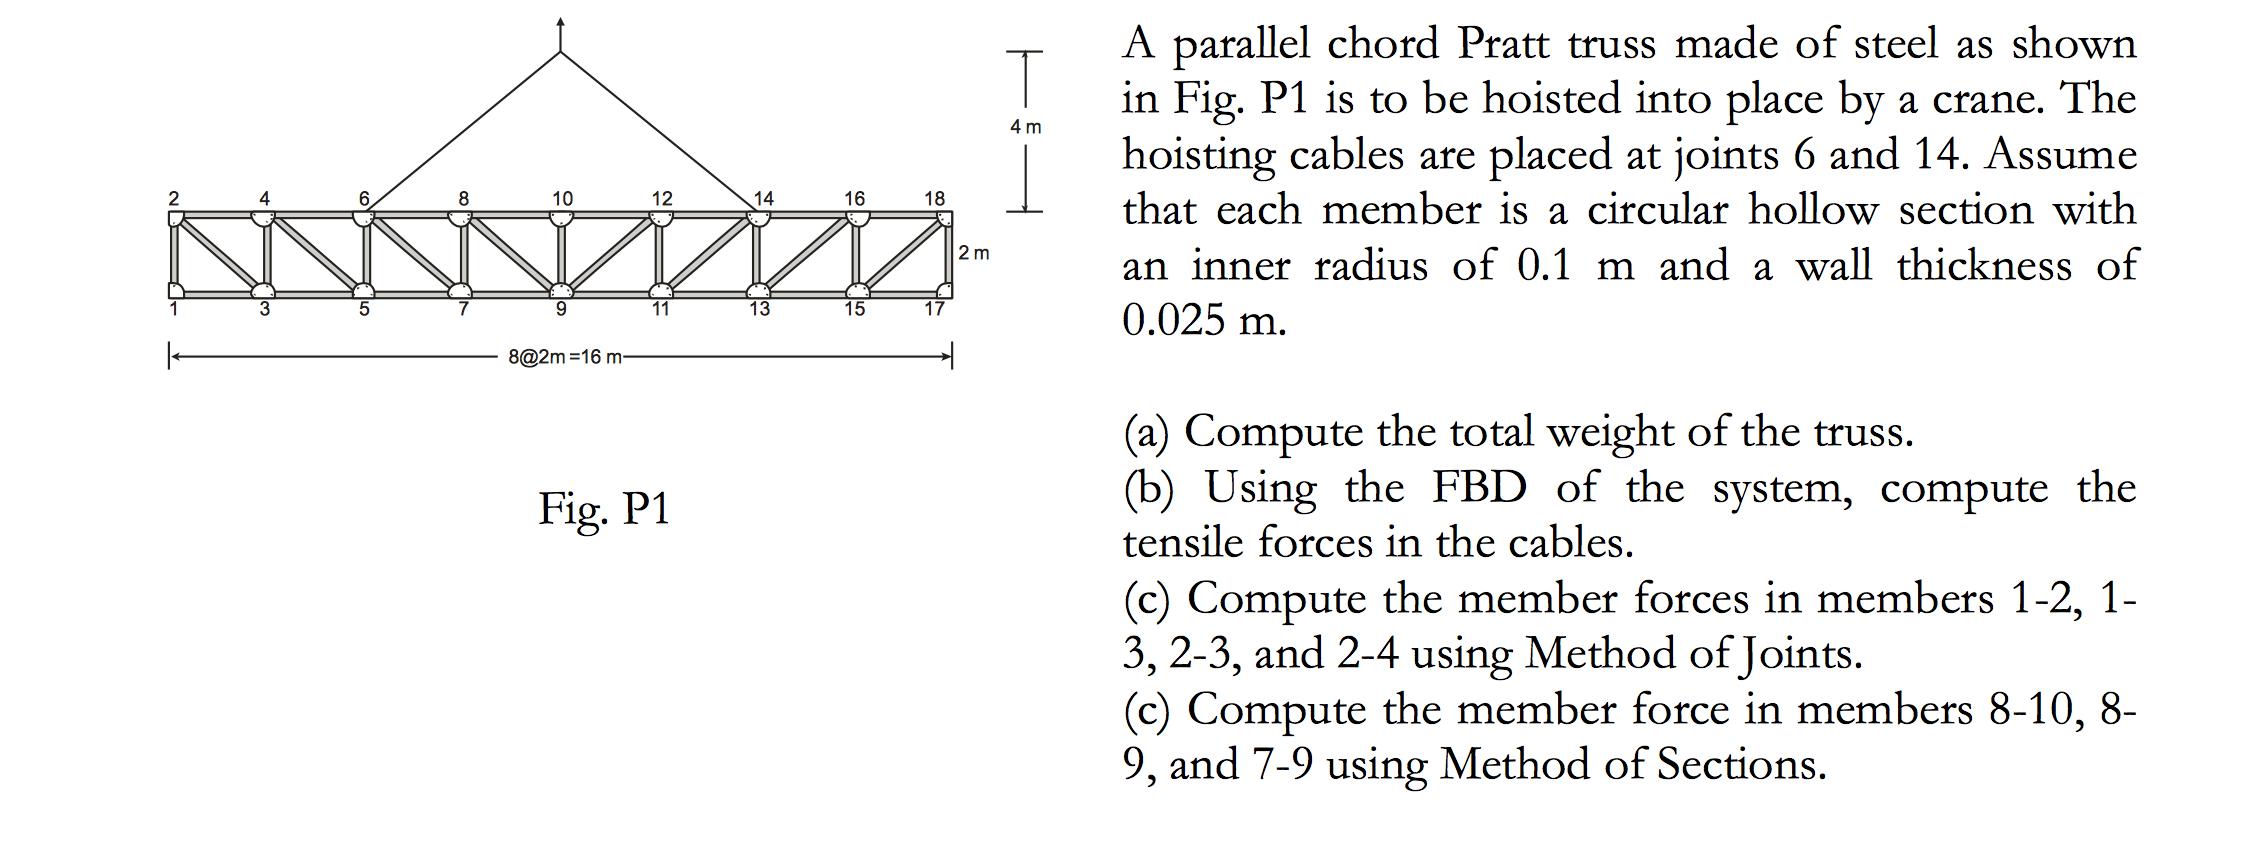 A parallel chord pratt truss made of steel as show chegg a parallel chord pratt truss made of steel as show hexwebz Choice Image